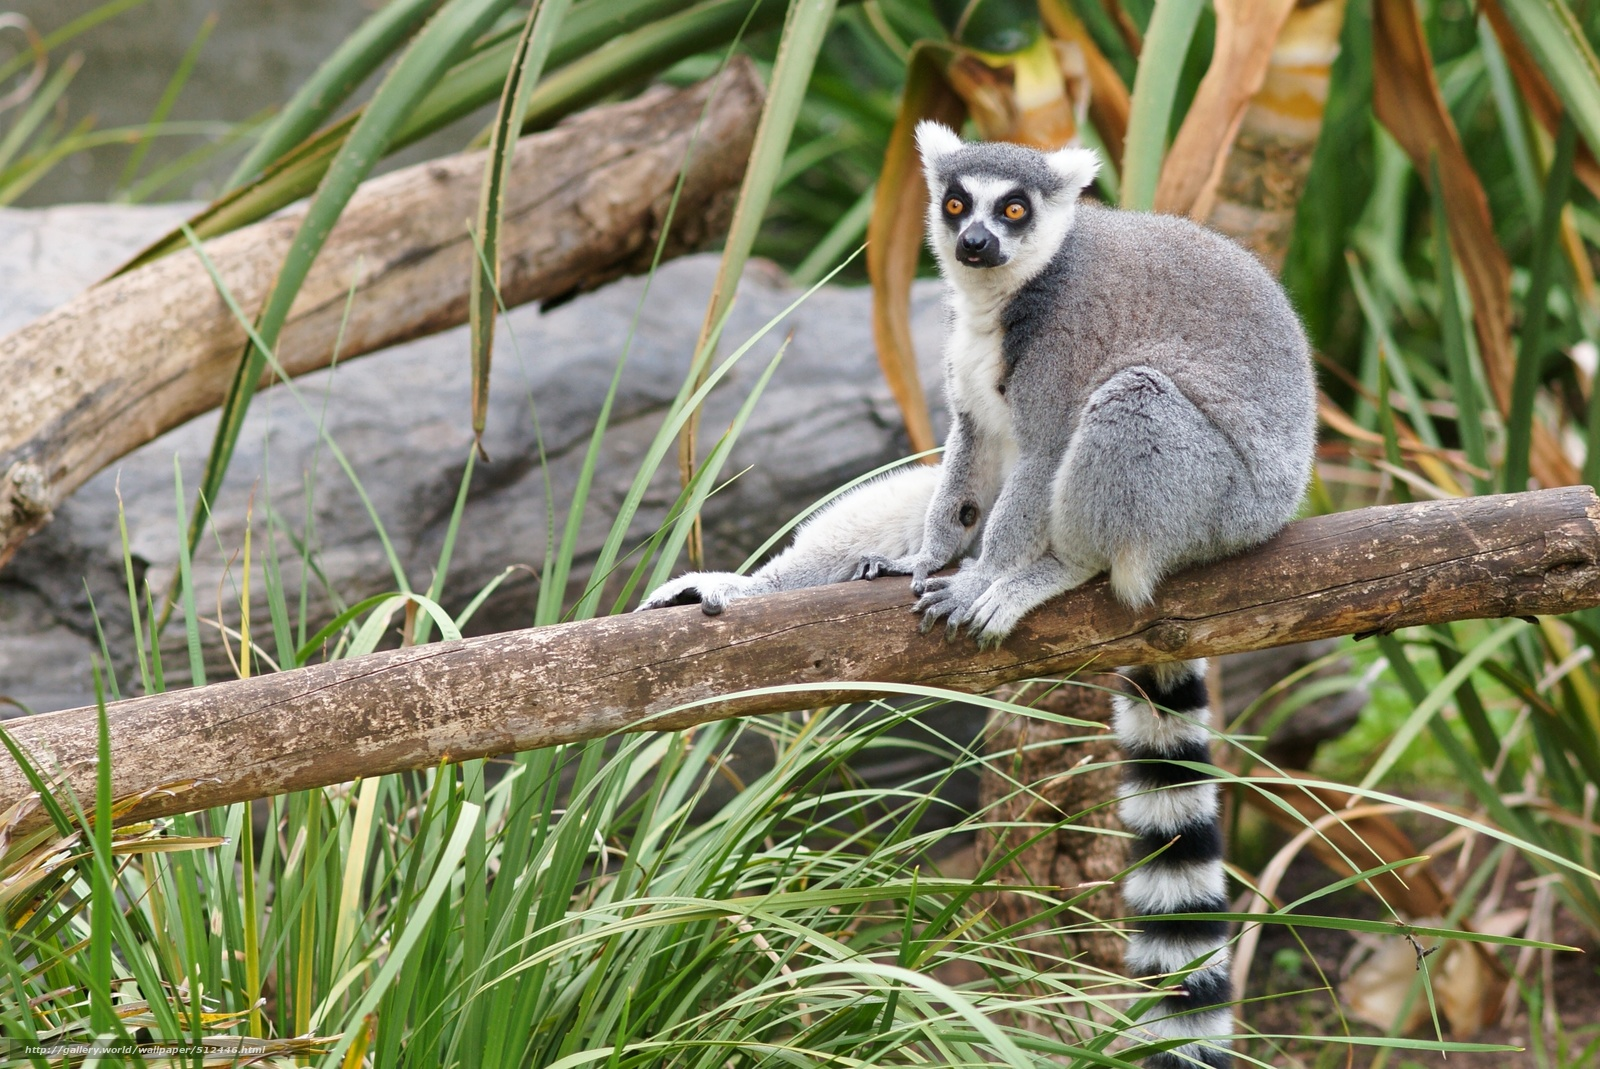 download wallpaper 3840x2160 lemur-#13